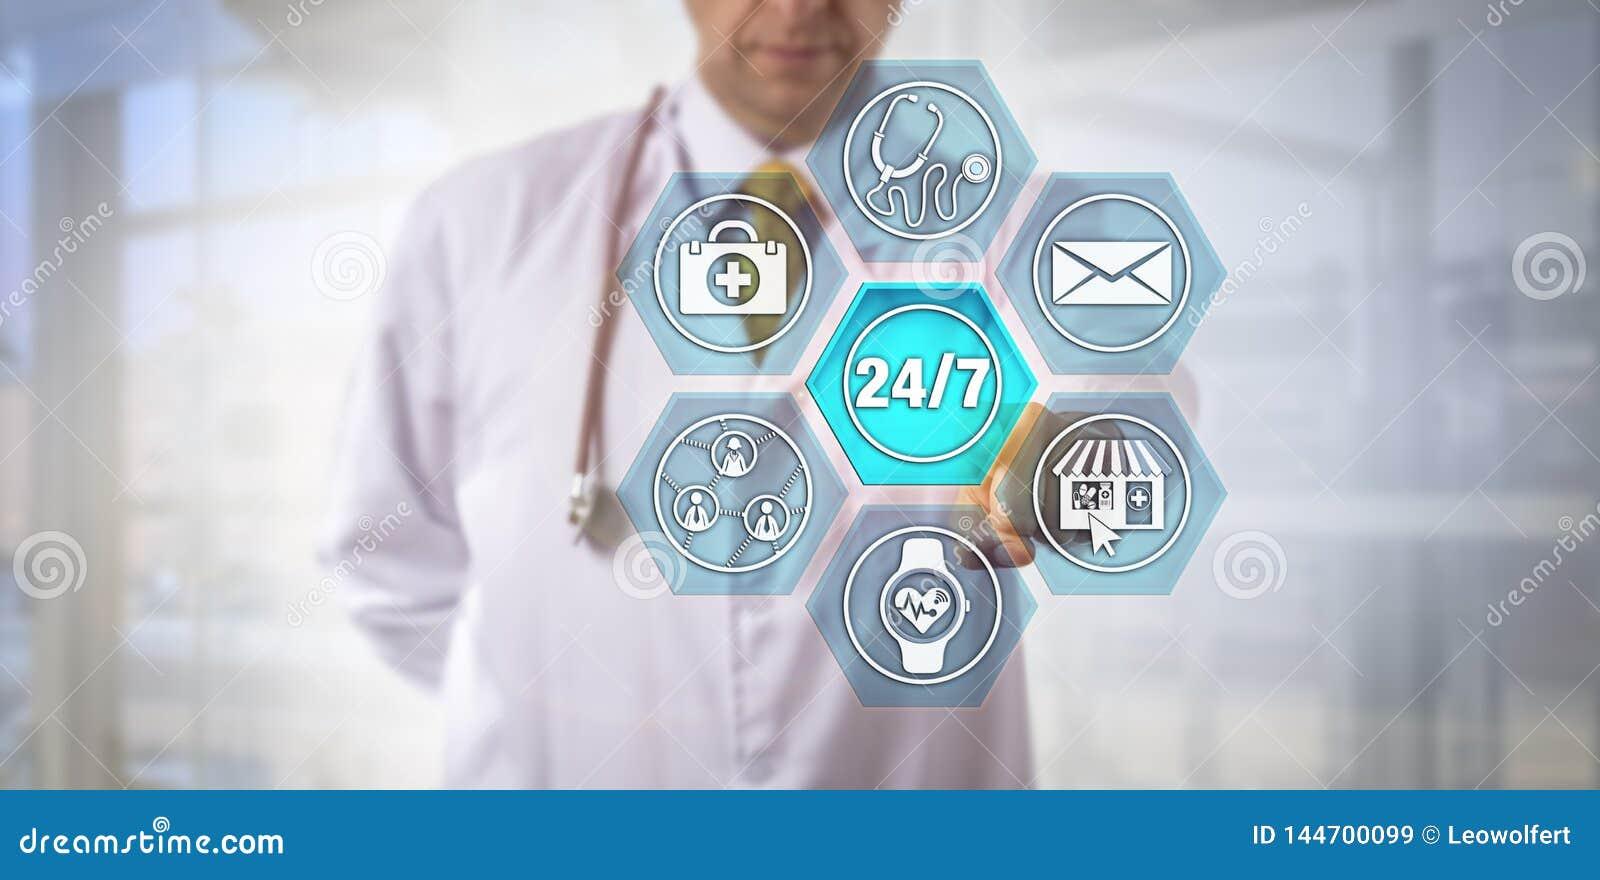 Médico Internet-esclarecido Activating 24/7 de serviço